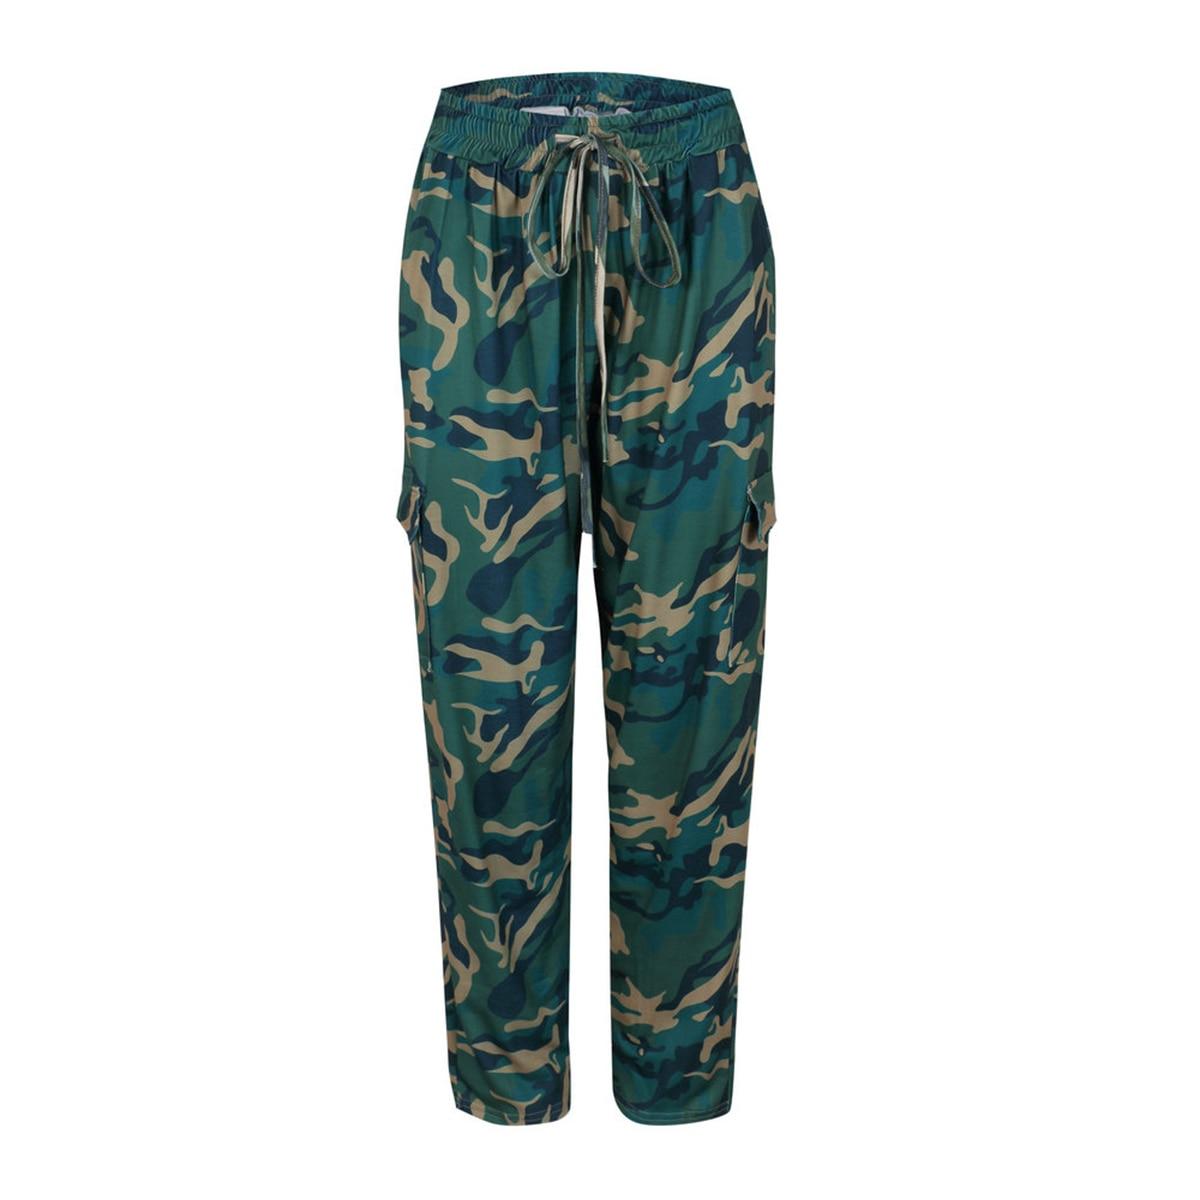 Summer Dress Women Camo Print Cargo Pant High Waist Hip Hop Trousers Pants Military Army Combat Camouflage Long Pants Capris